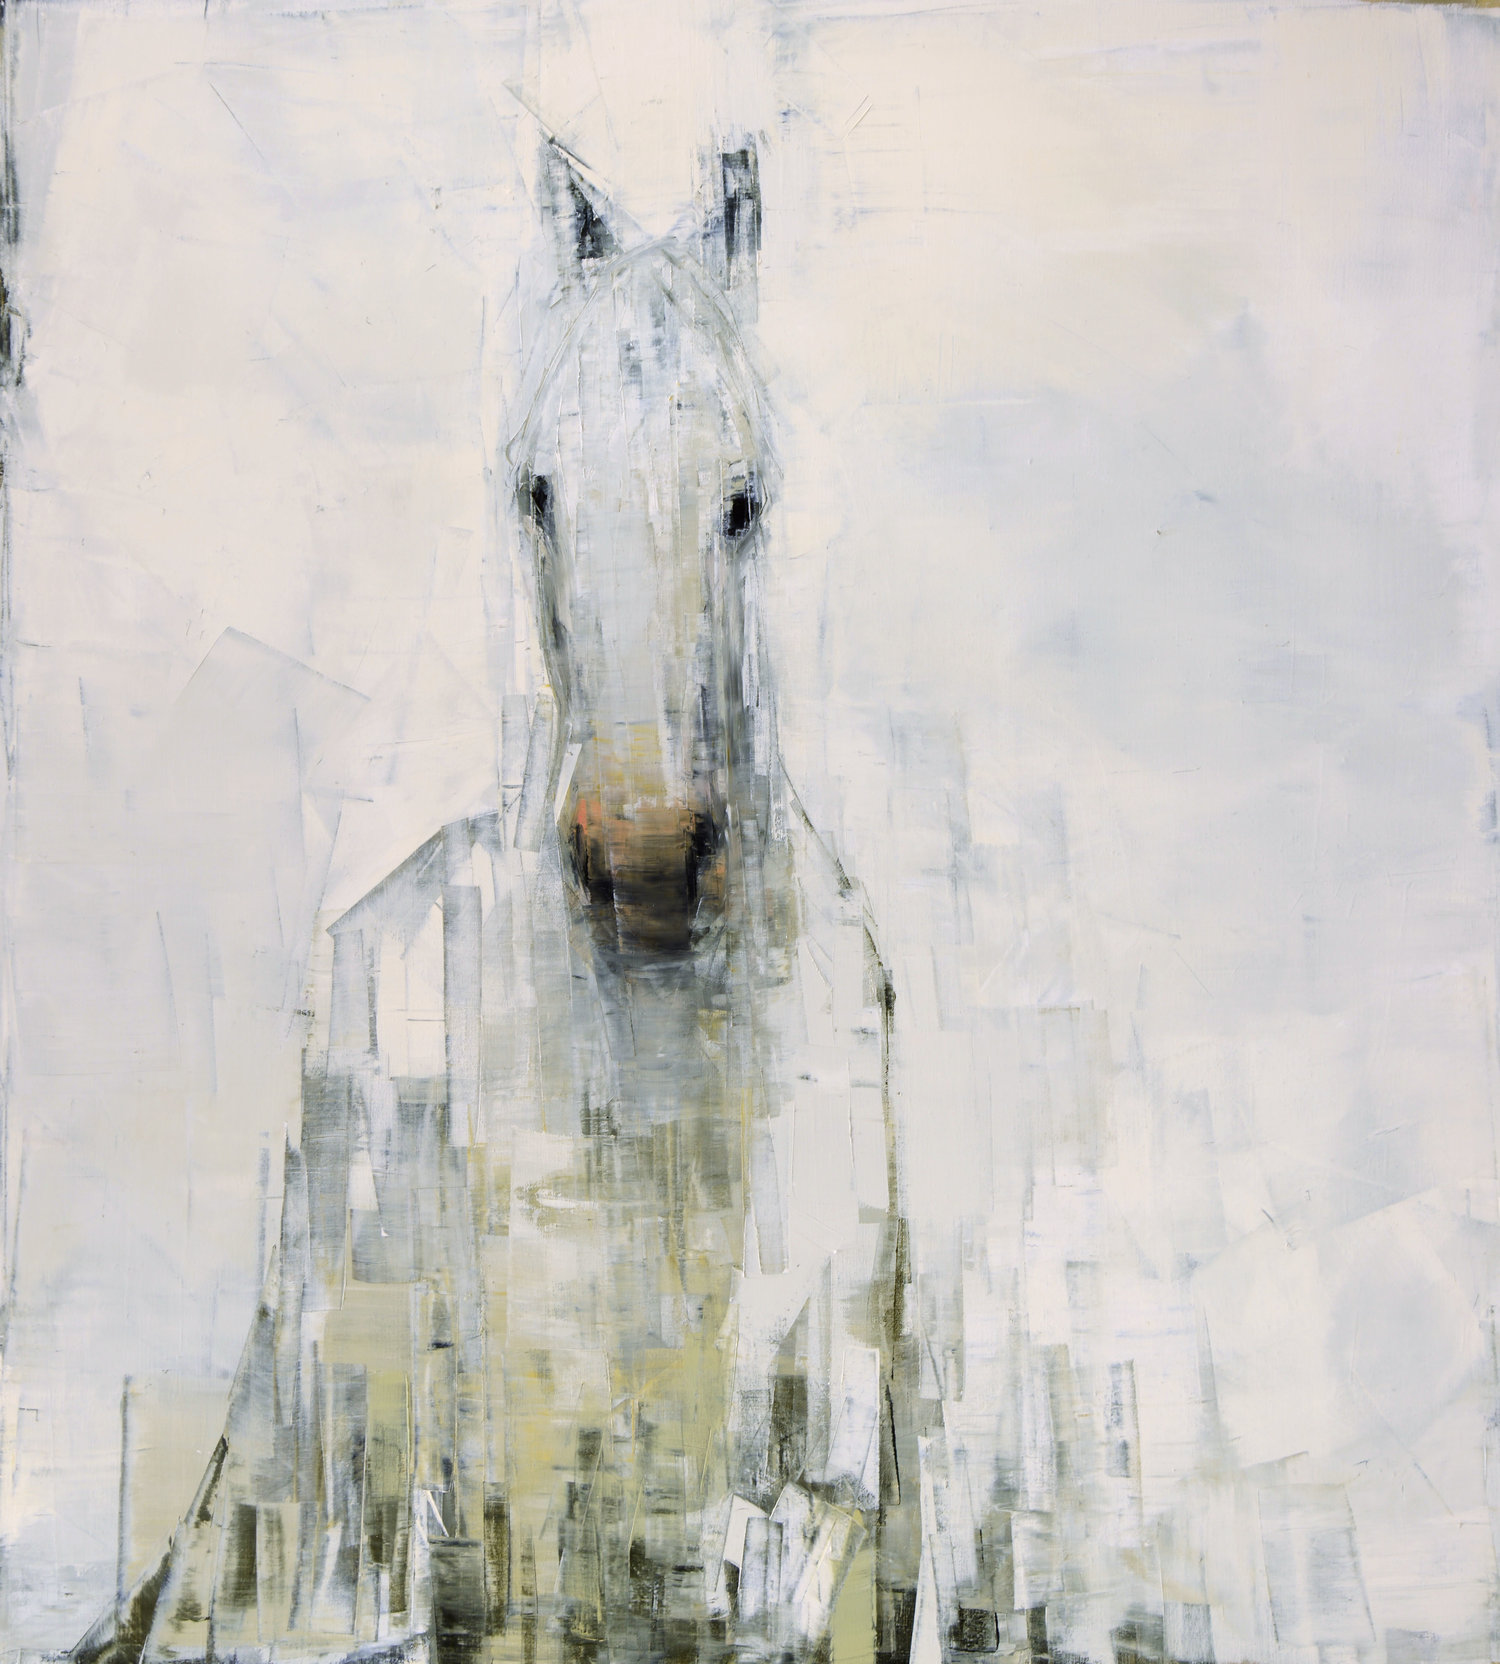 White+Horse+(on+White)_64x58.jpg